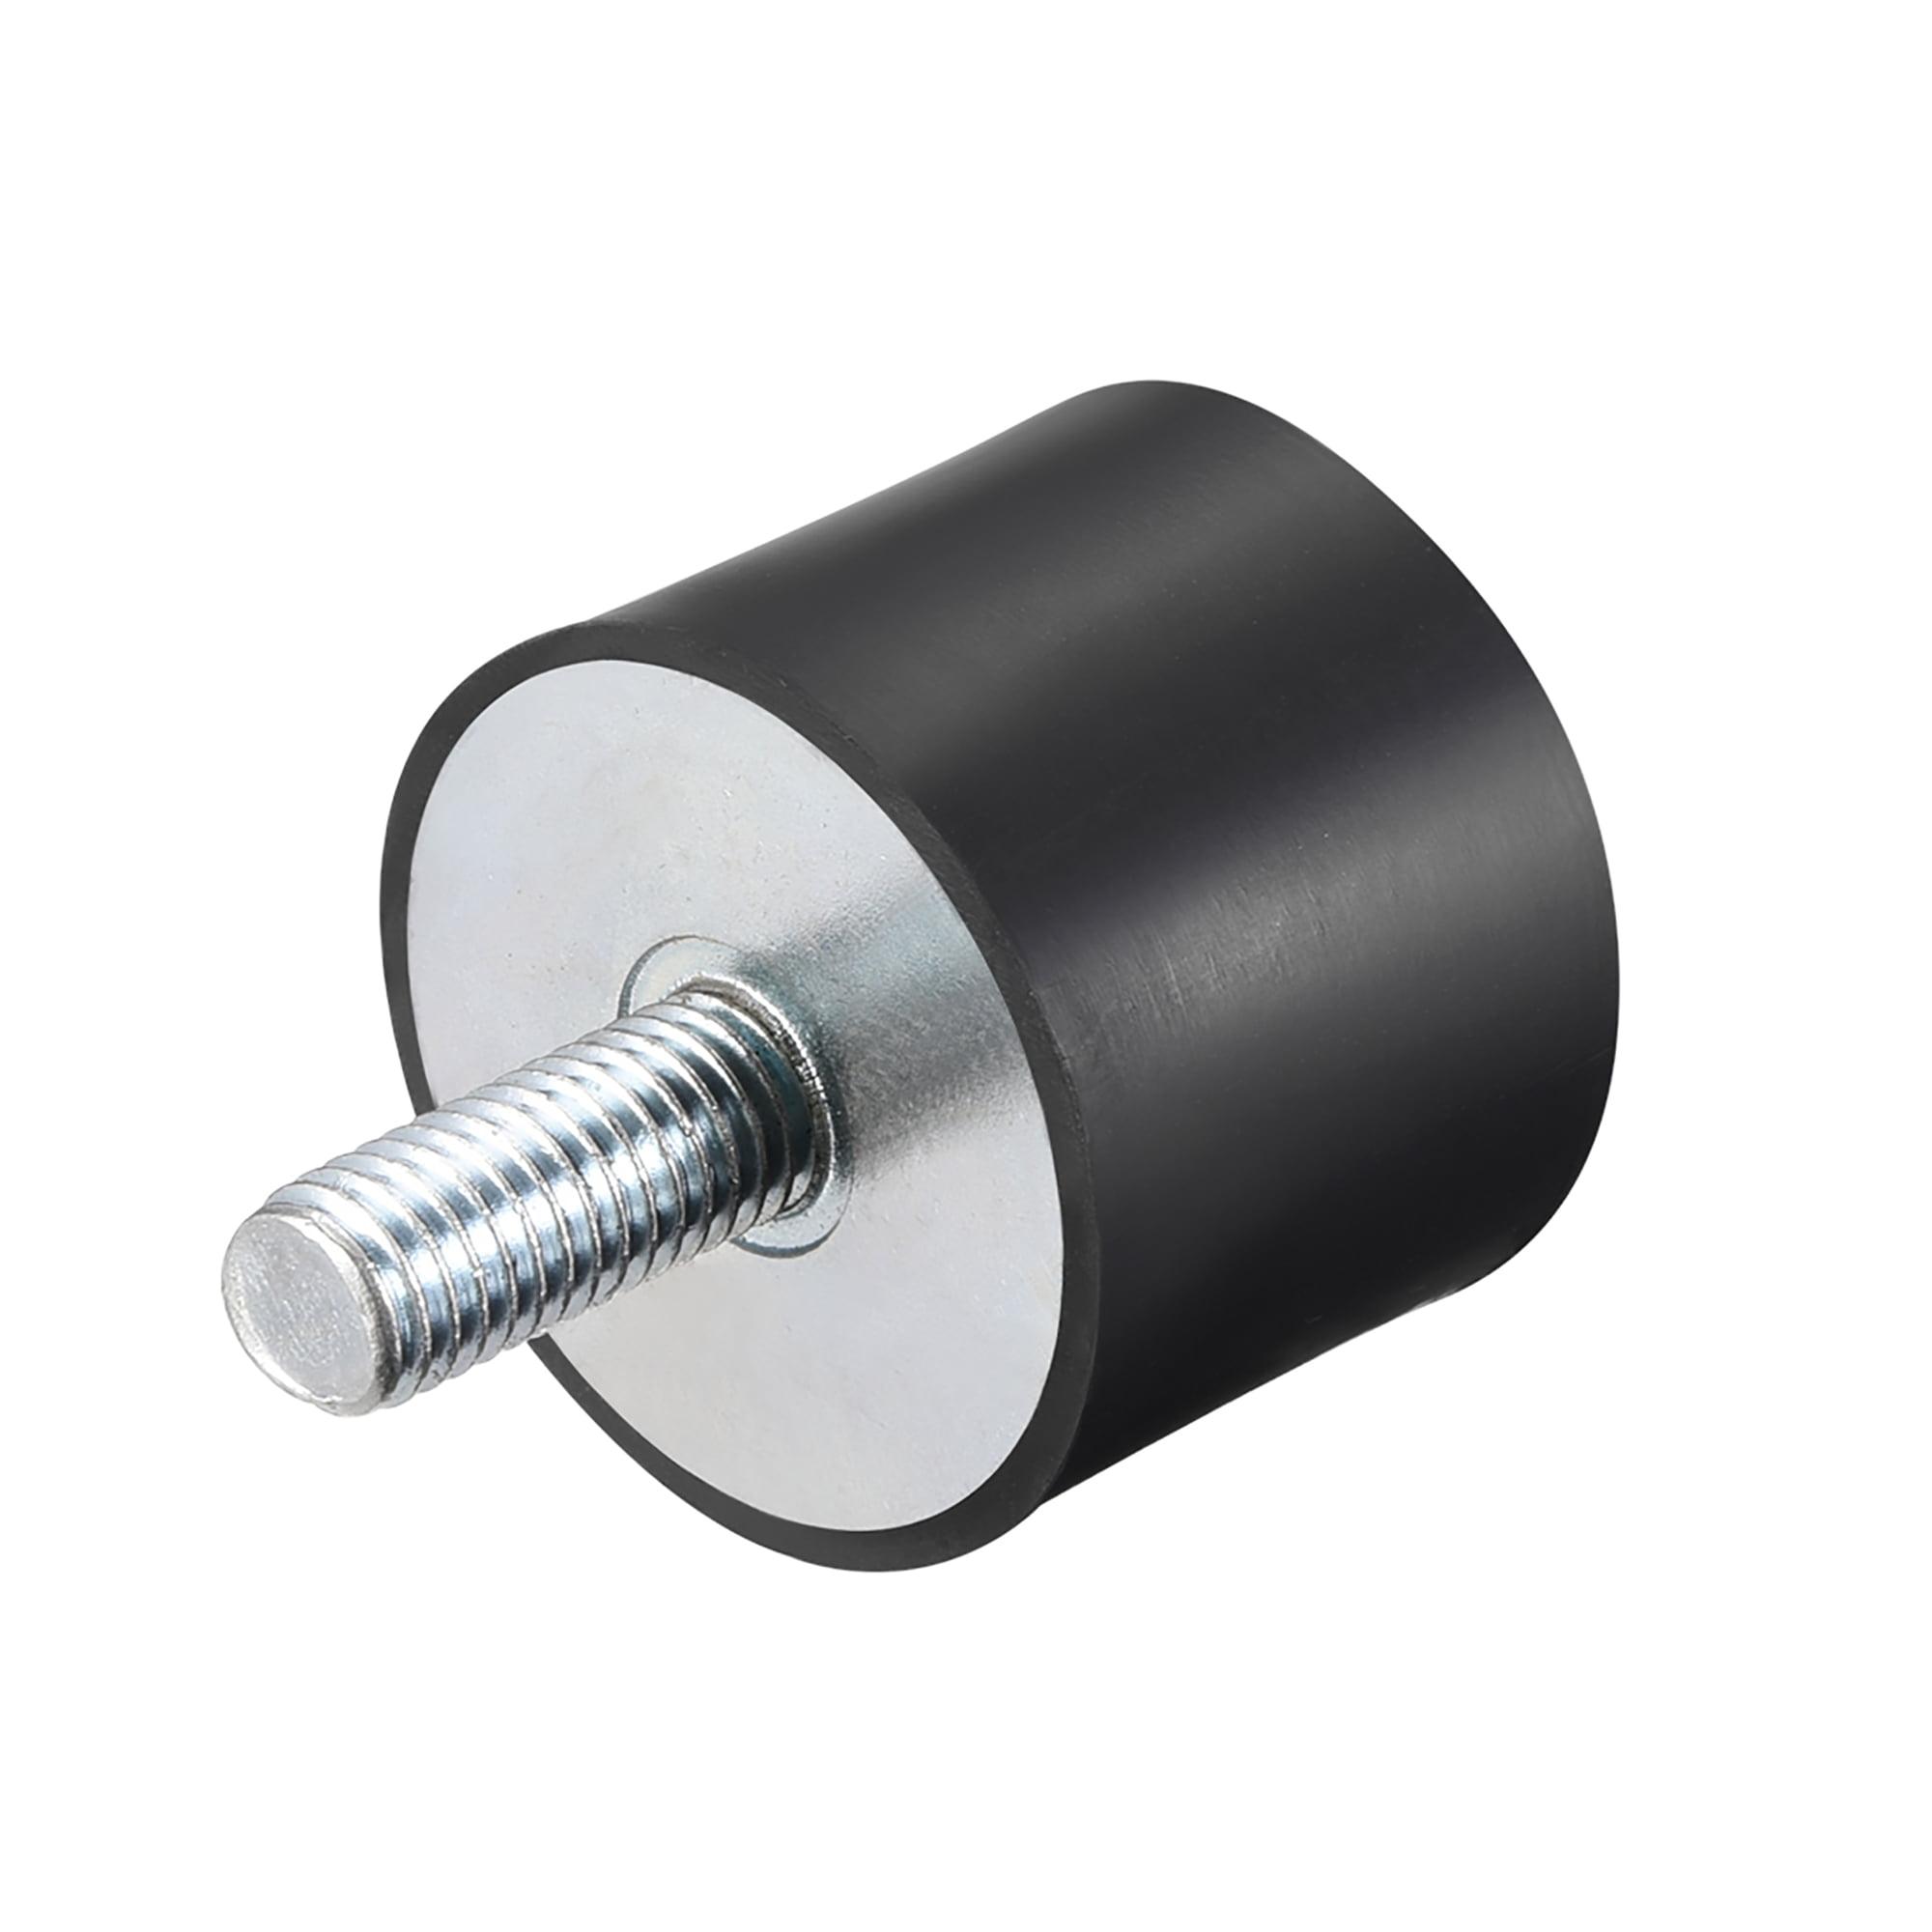 M10 Male Female Rubber Mounts Shock Absorber Anti Vibration Isolators 40mm x 30mm - image 1 de 3